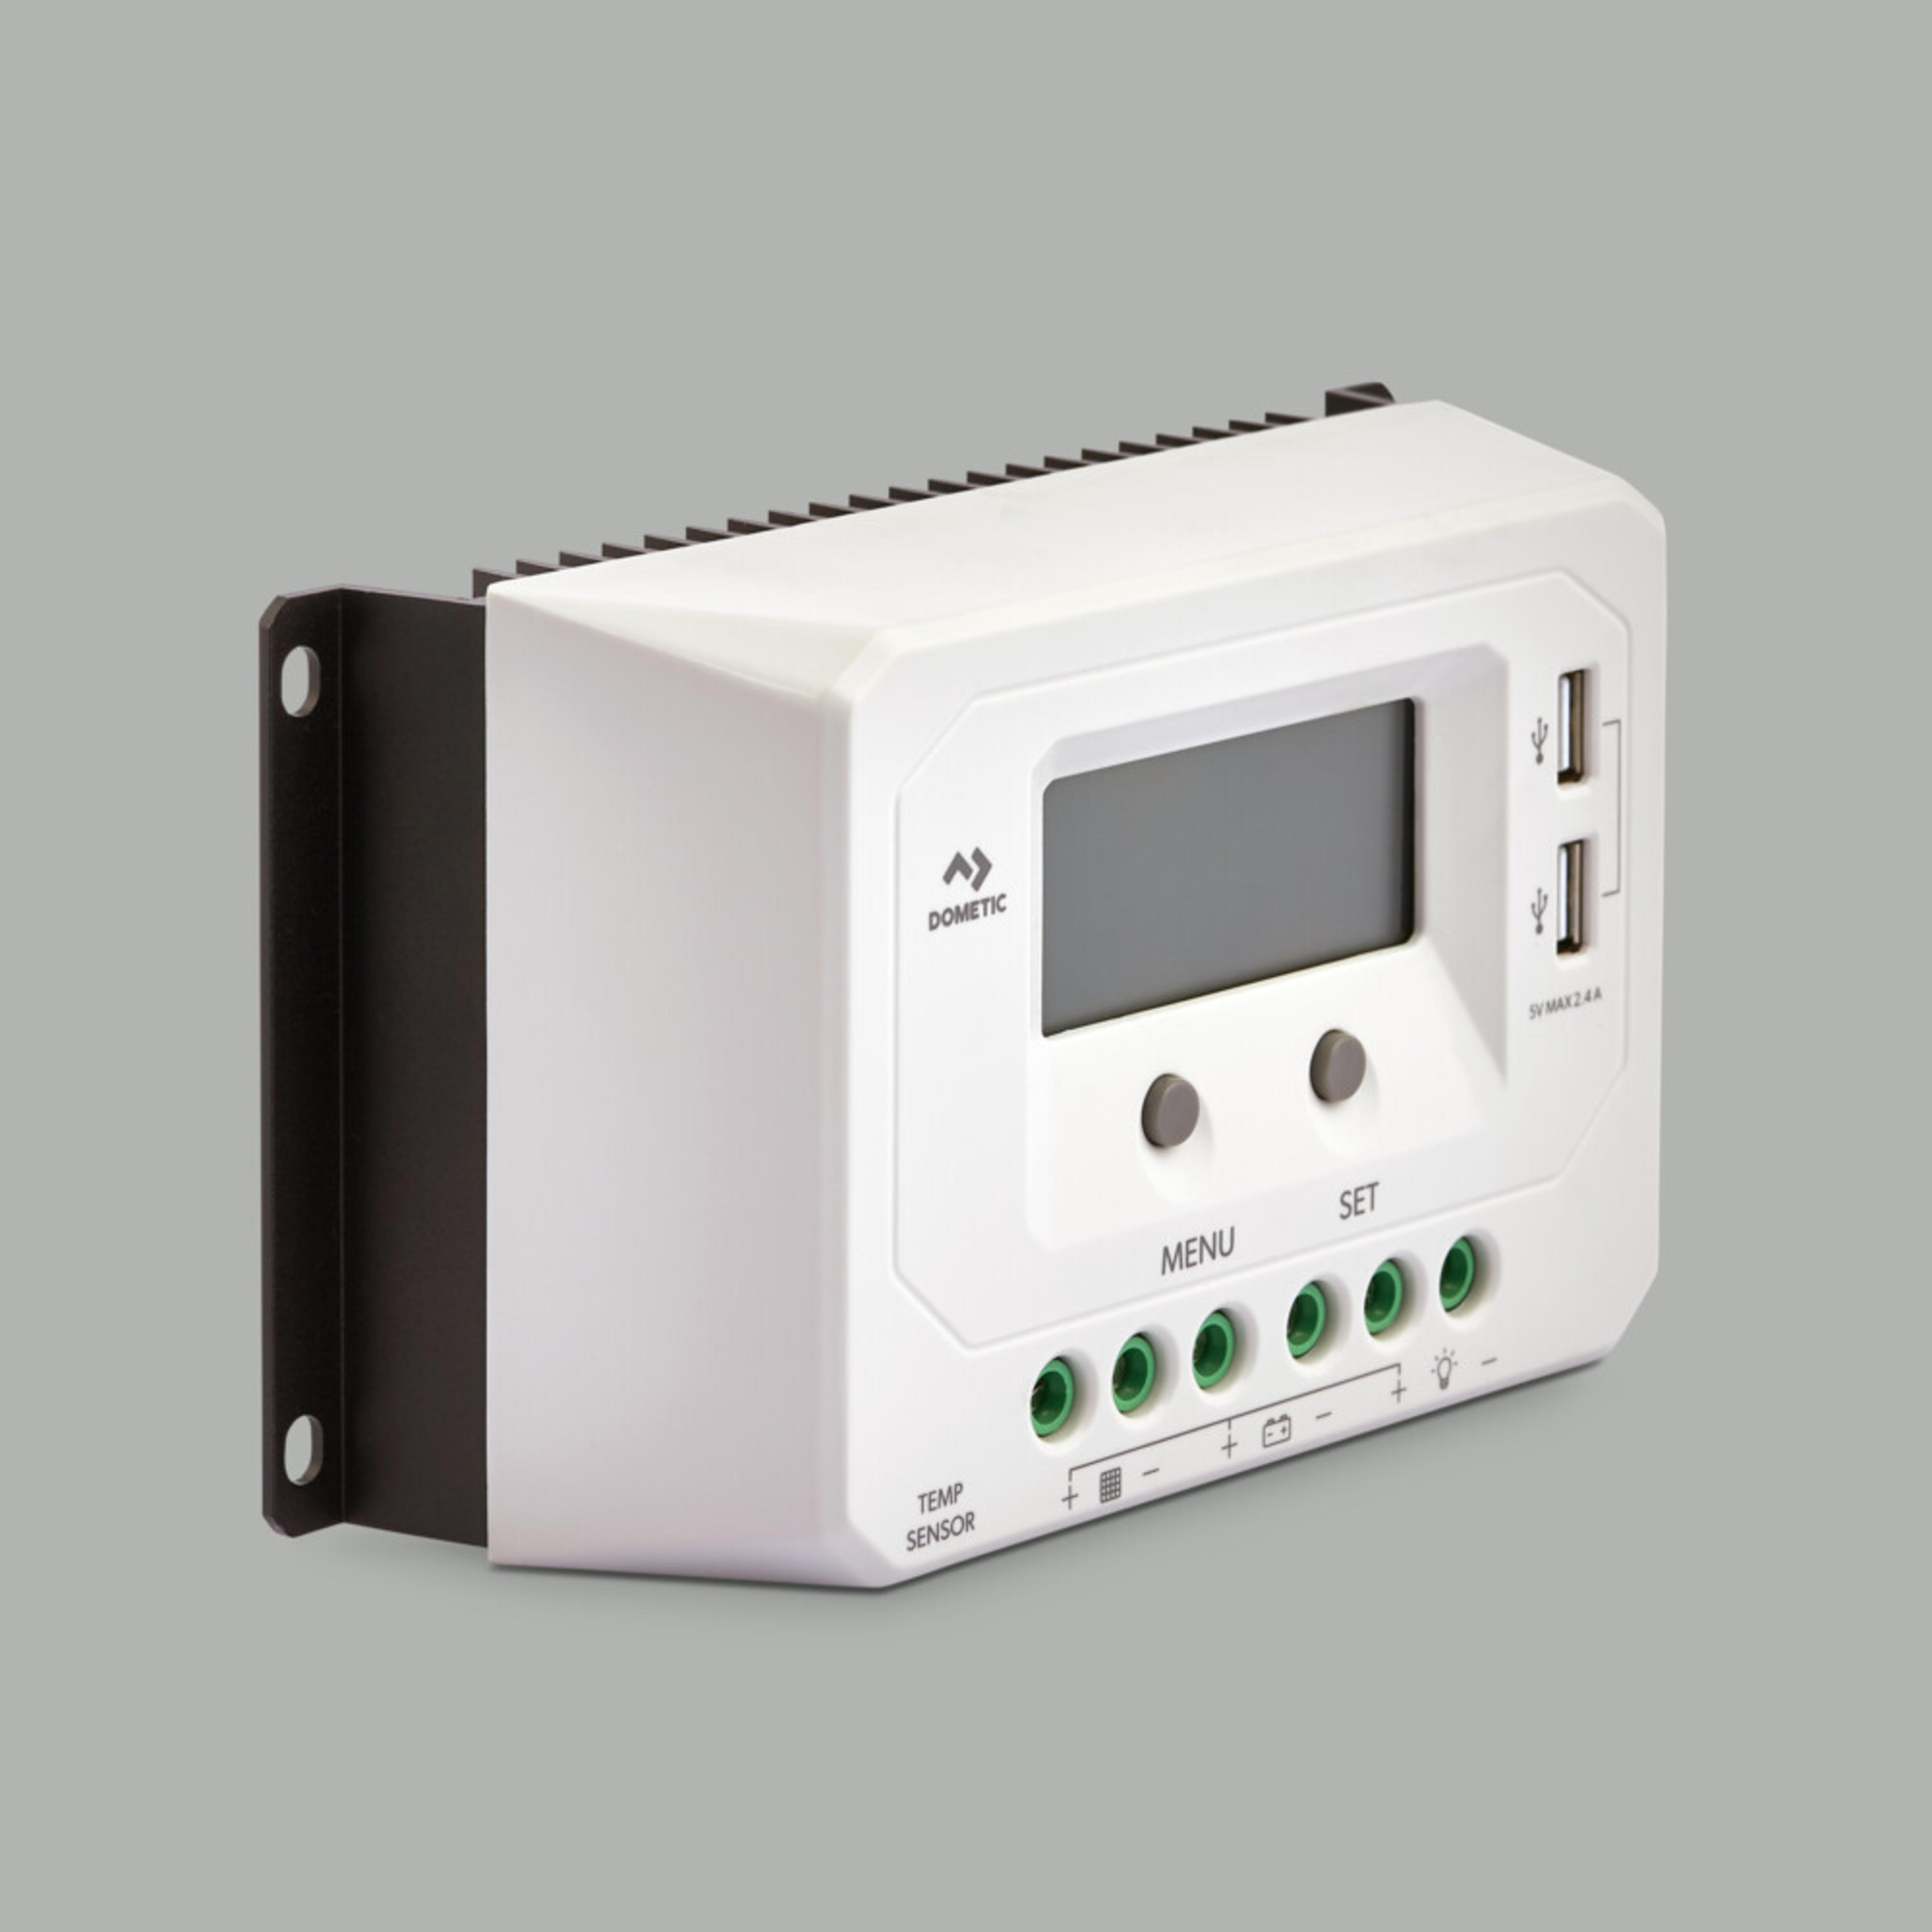 Dometic SC1230